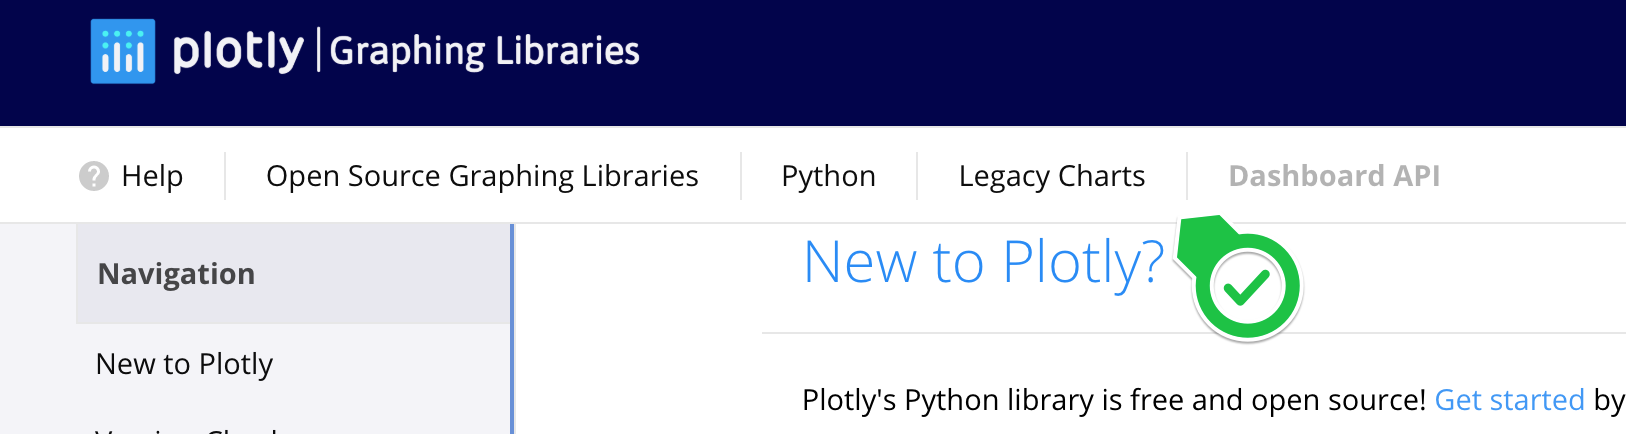 python docs] Plotly Fundamentals reorg · Issue #1360 · plotly